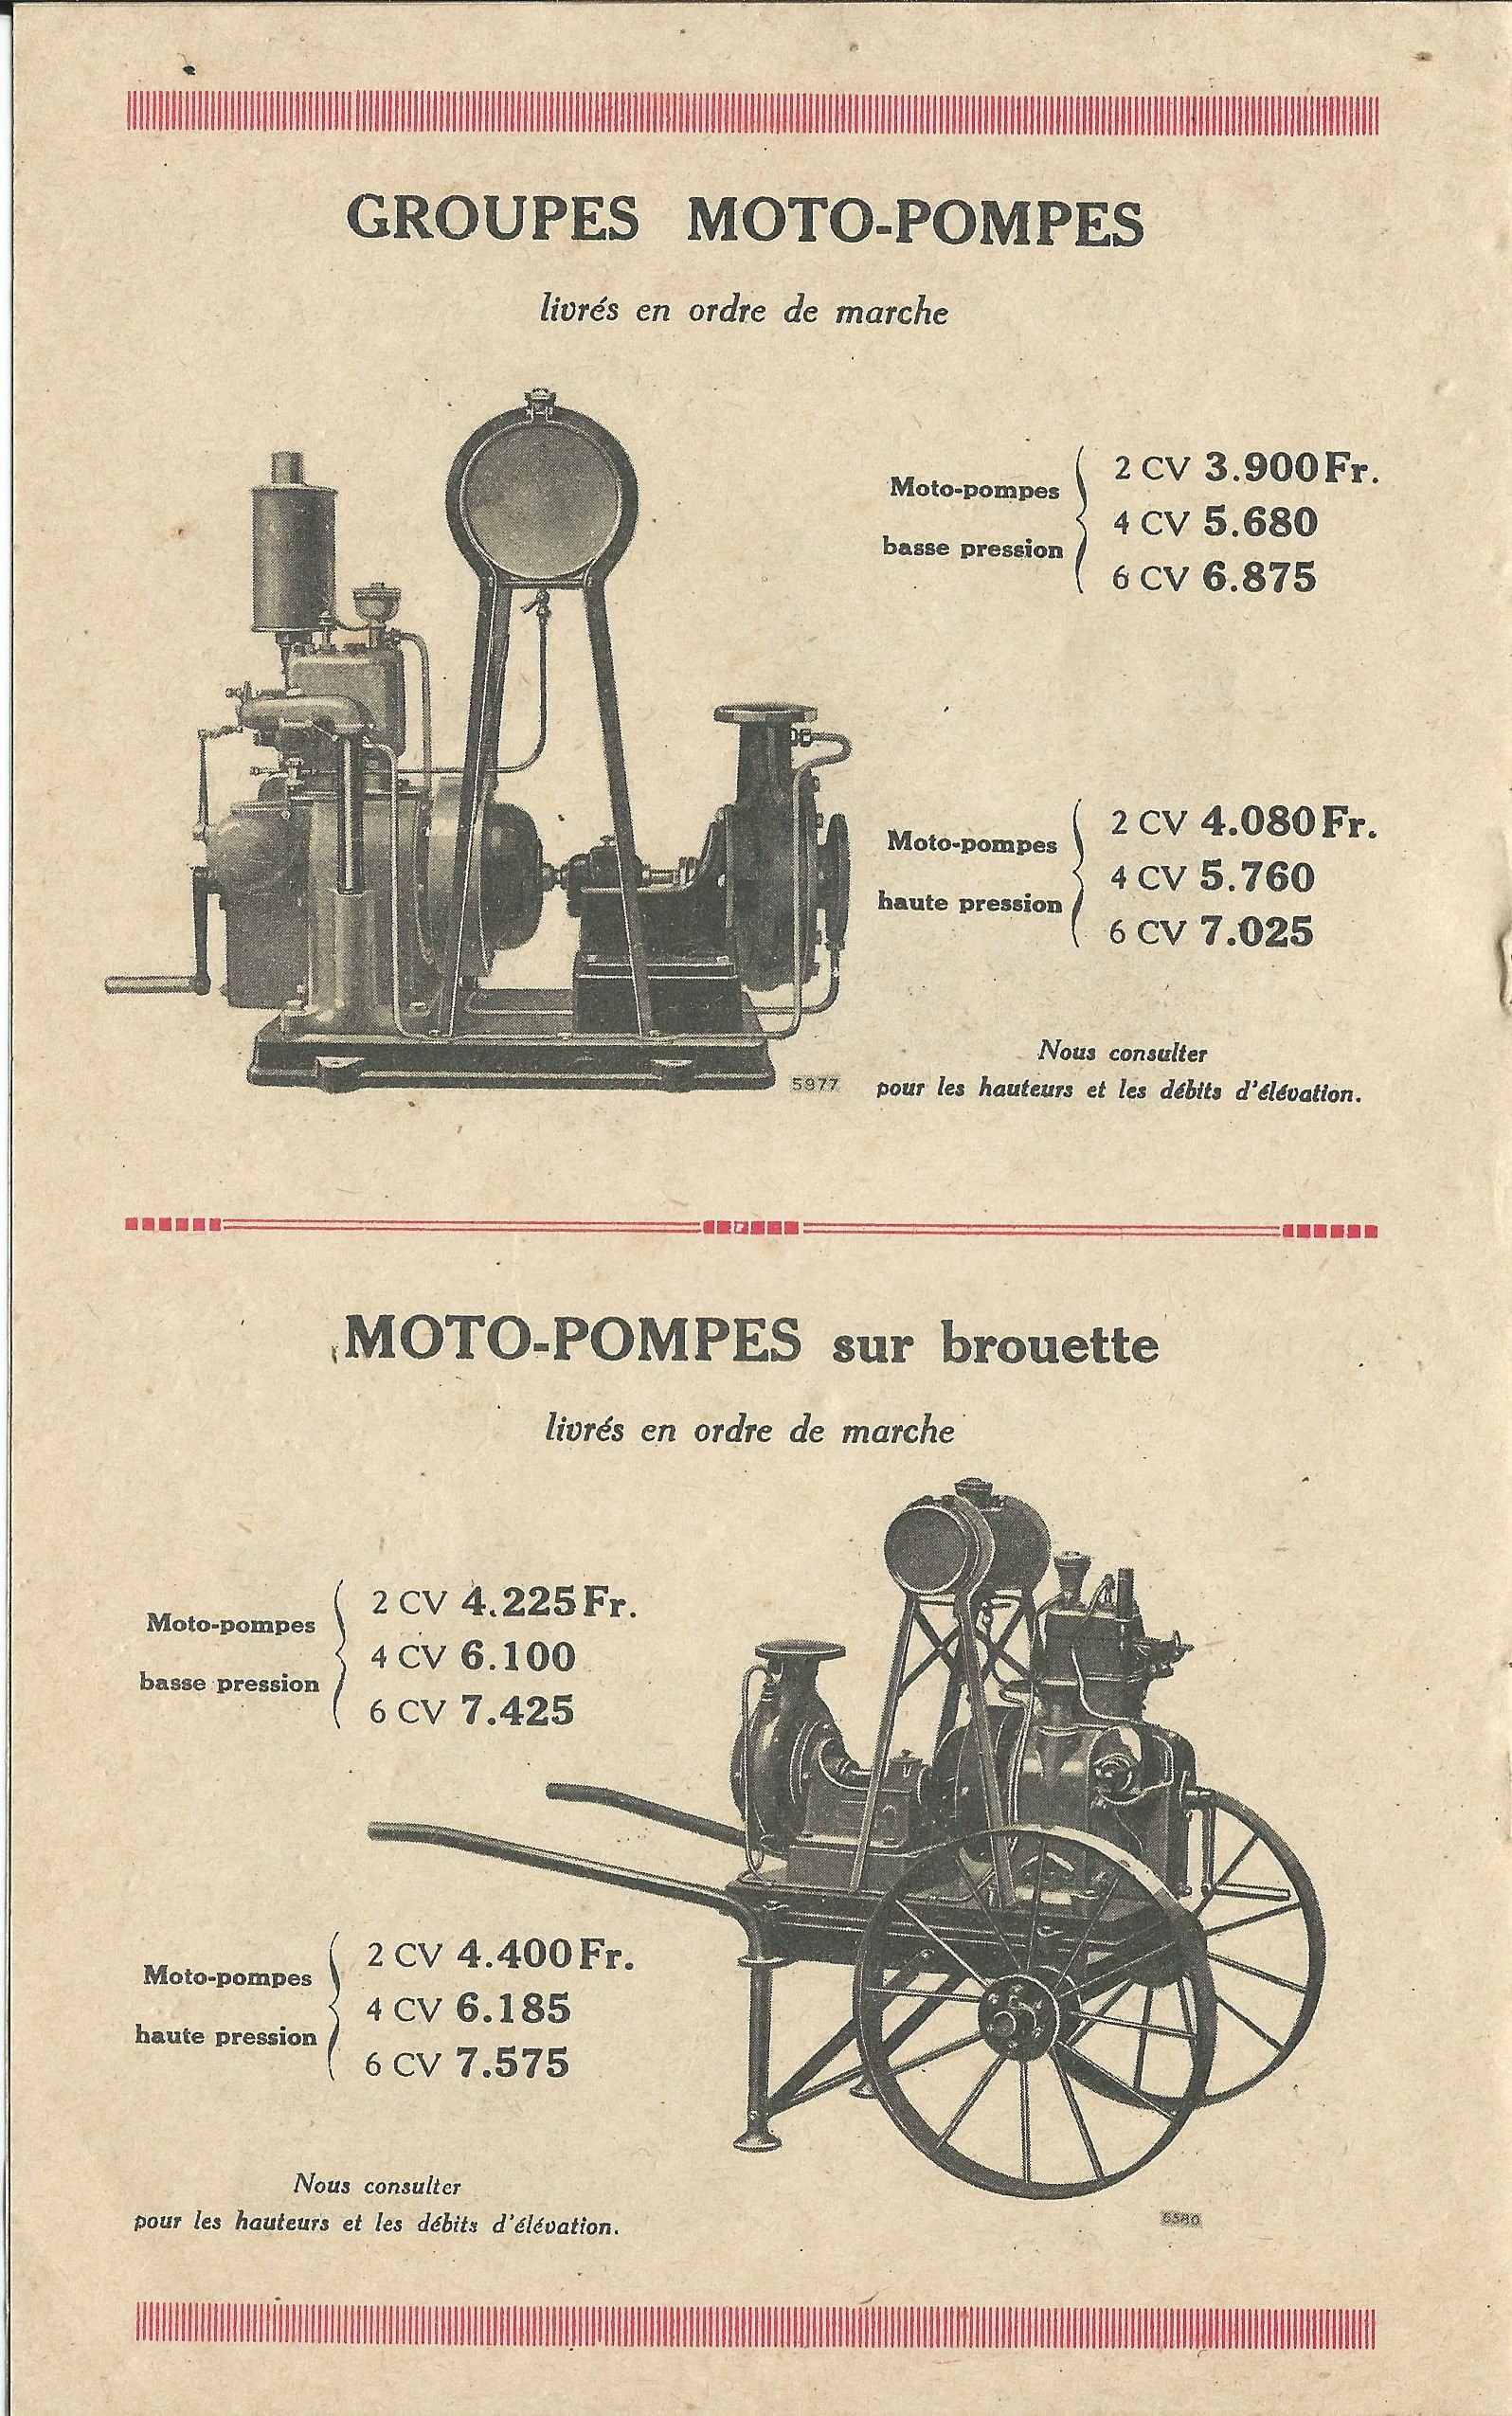 RENAULT - moteur renault 263 770830RENAULTmoteursfixes1927006